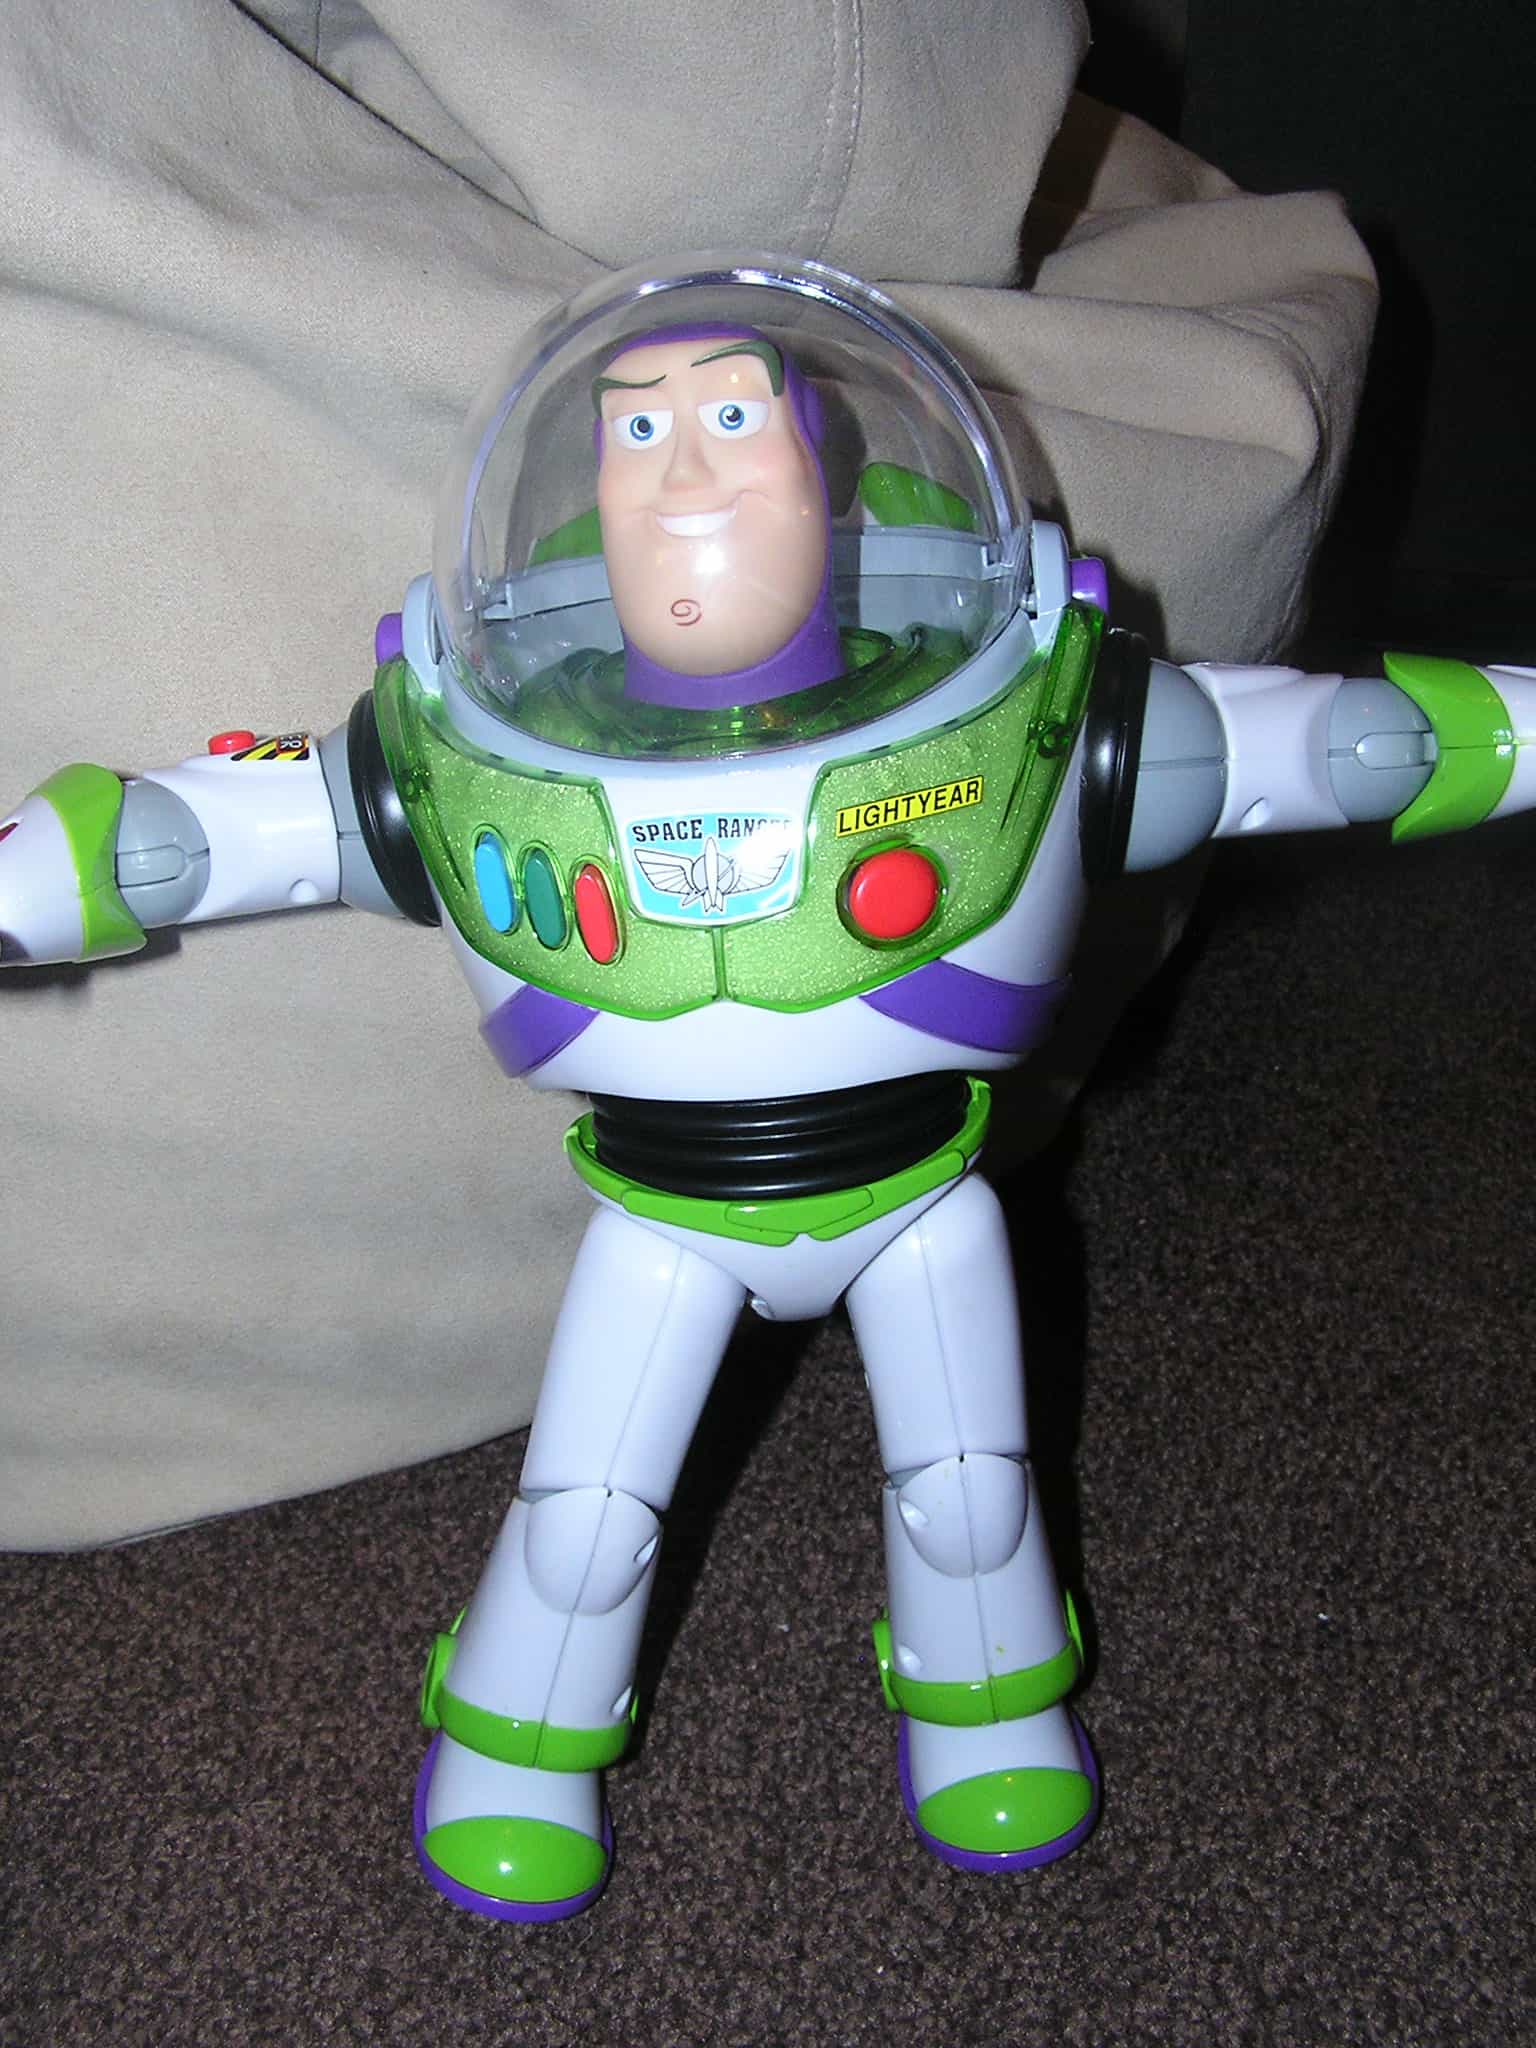 Disney Store Buzz Lightyear